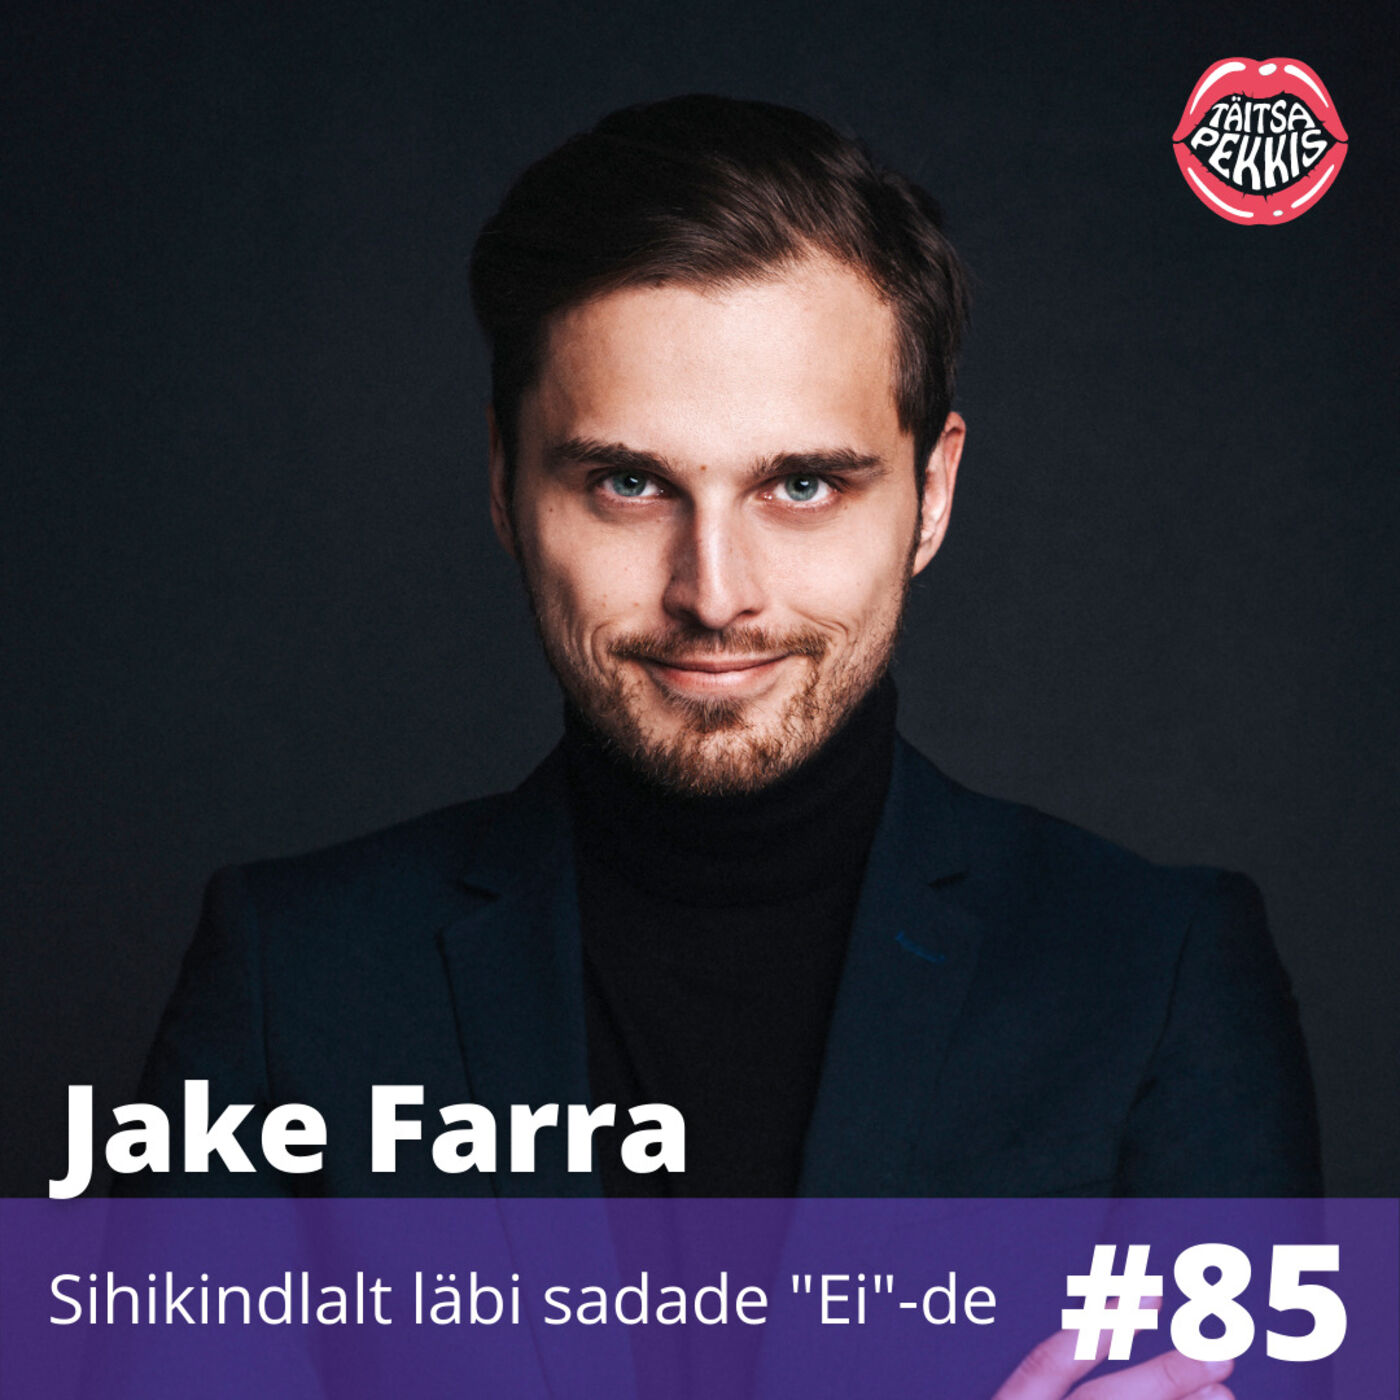 "#85 - Jake Farra - Sihikindlalt läbi sadade ""Ei""-de"